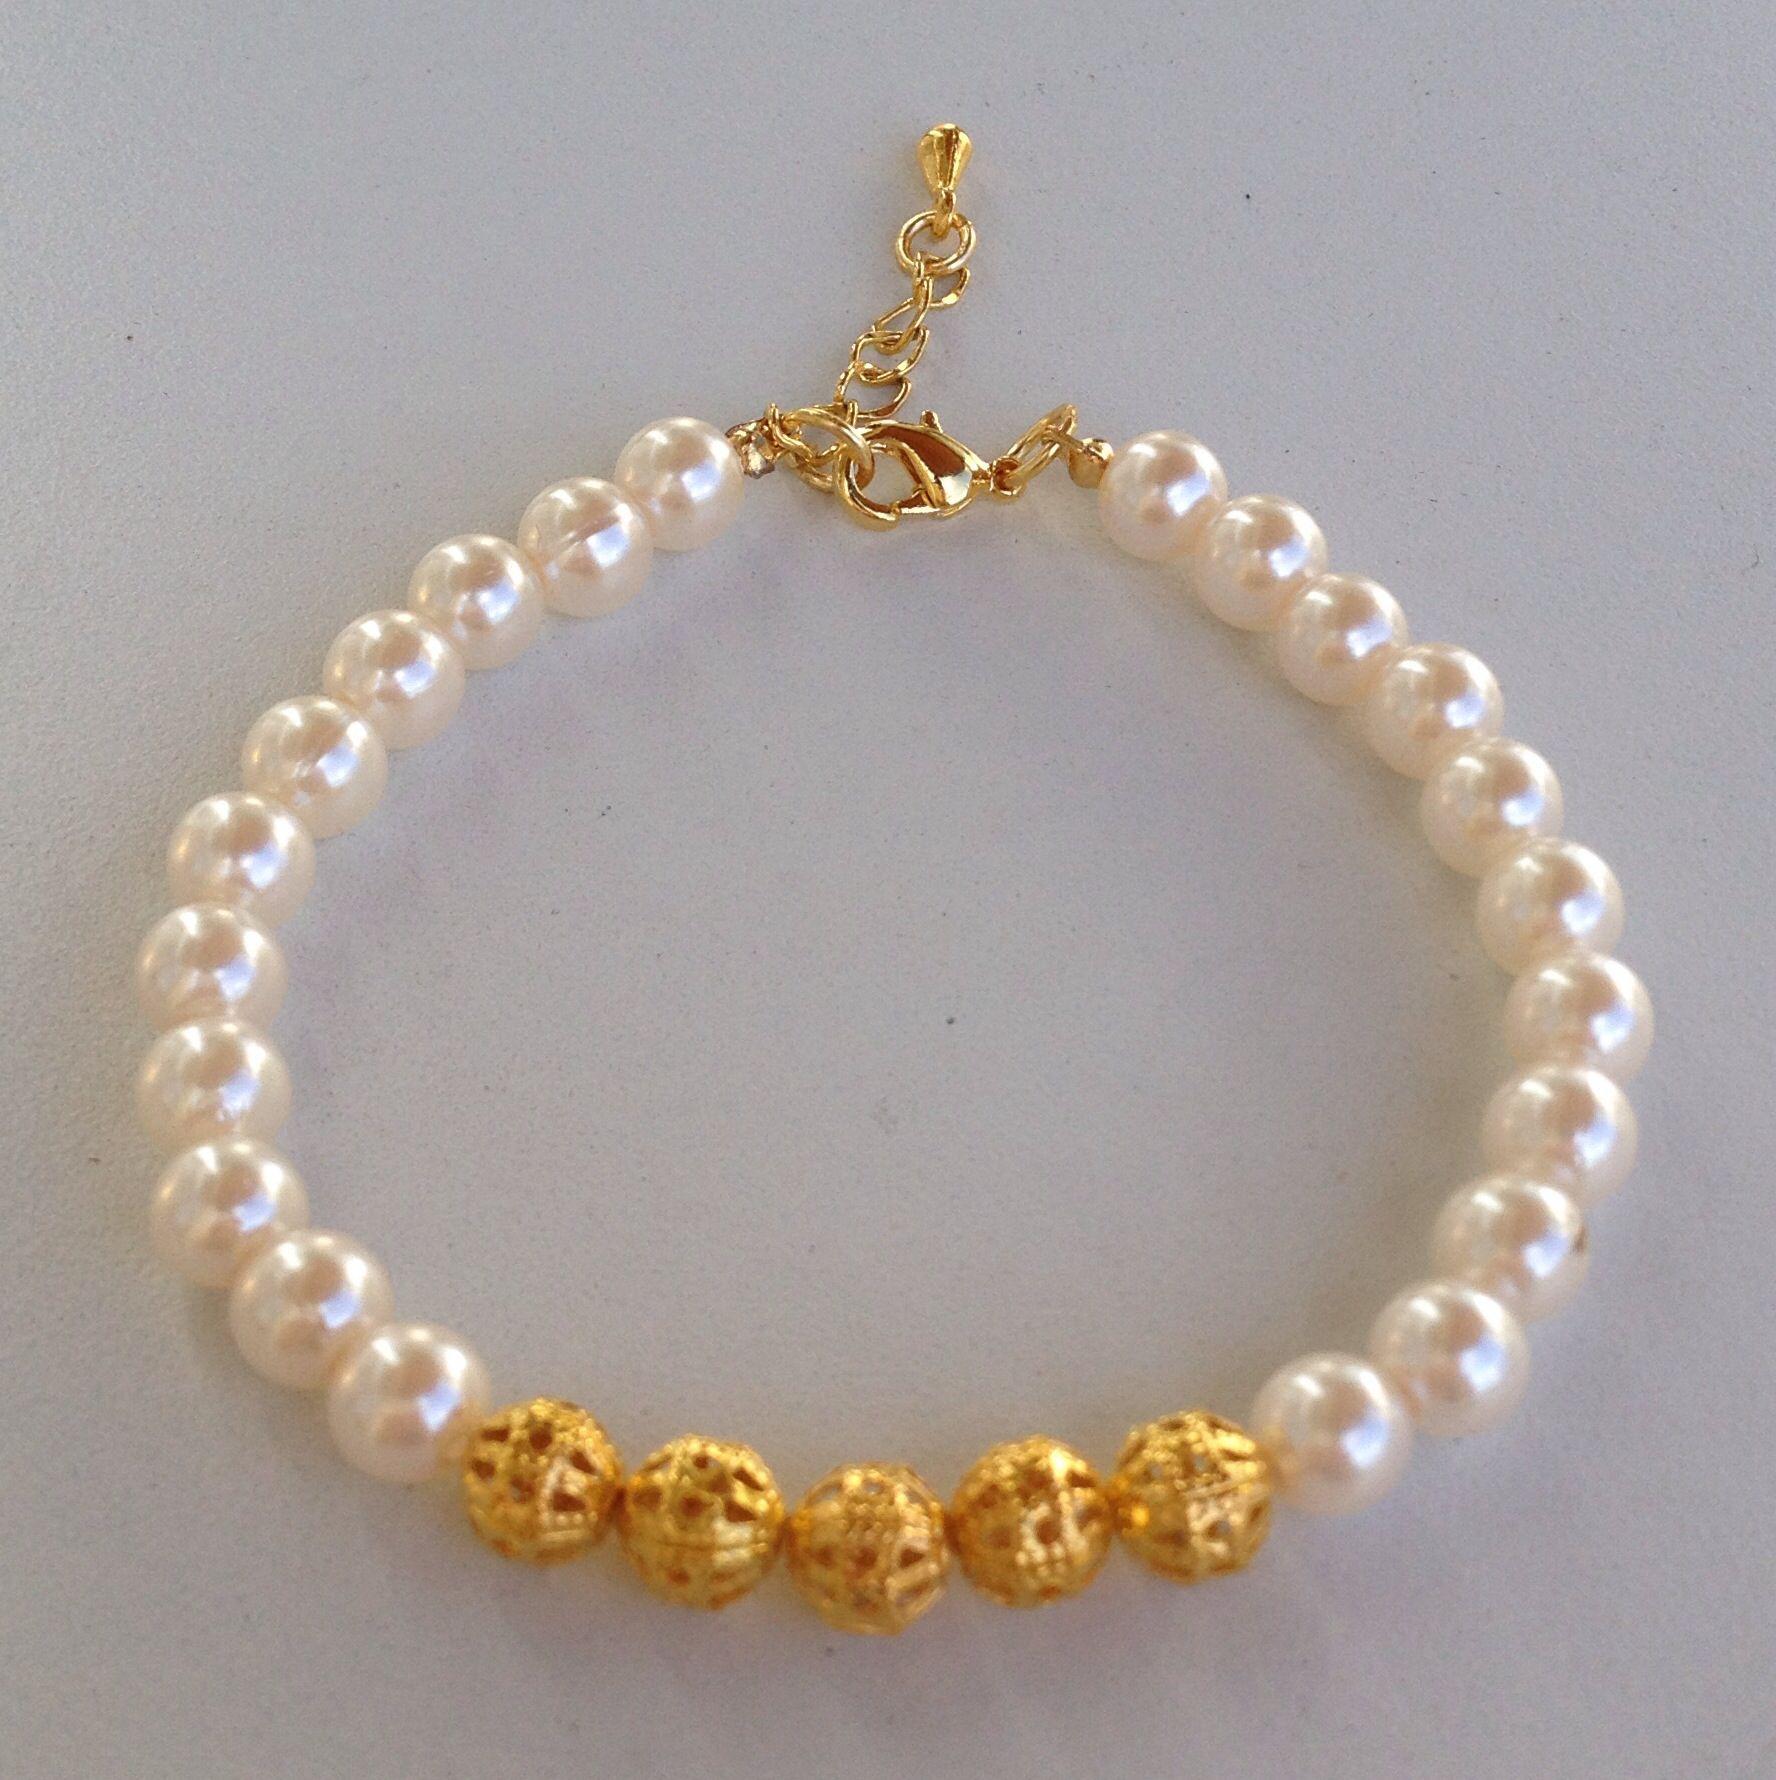 Pearl bracelet pulseira de perolas